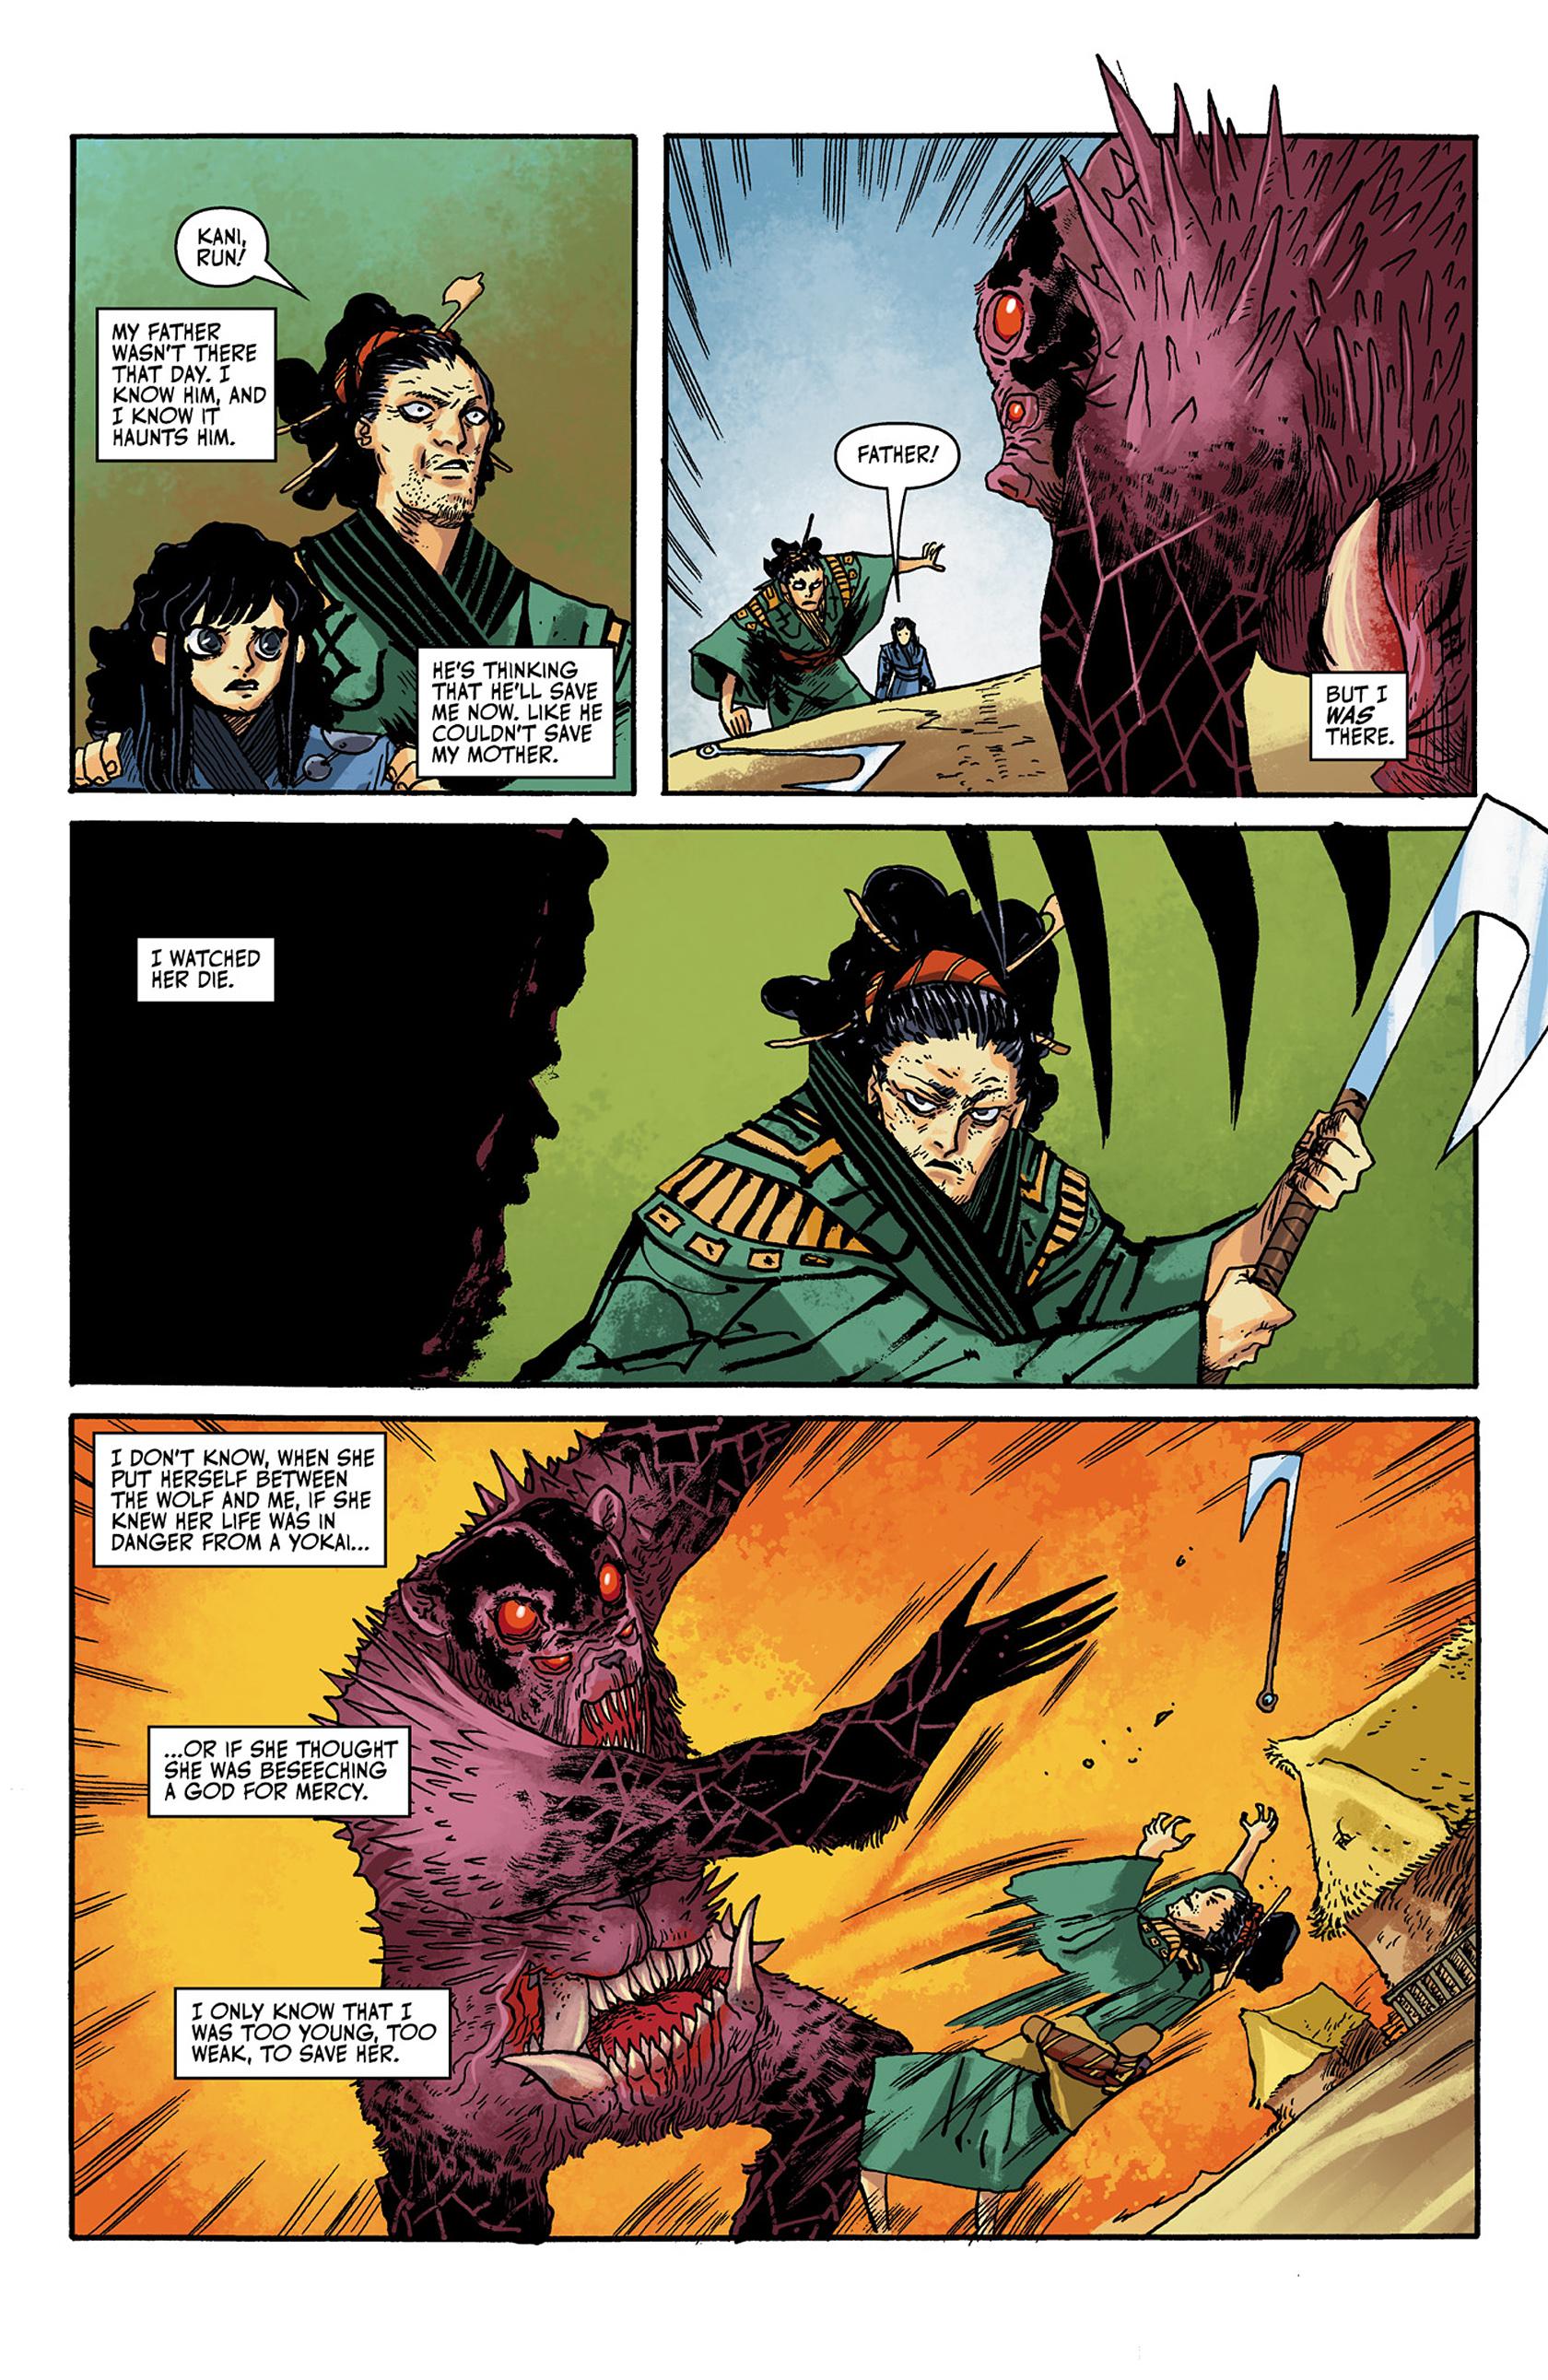 Read online Akaneiro comic -  Issue #1 - 8